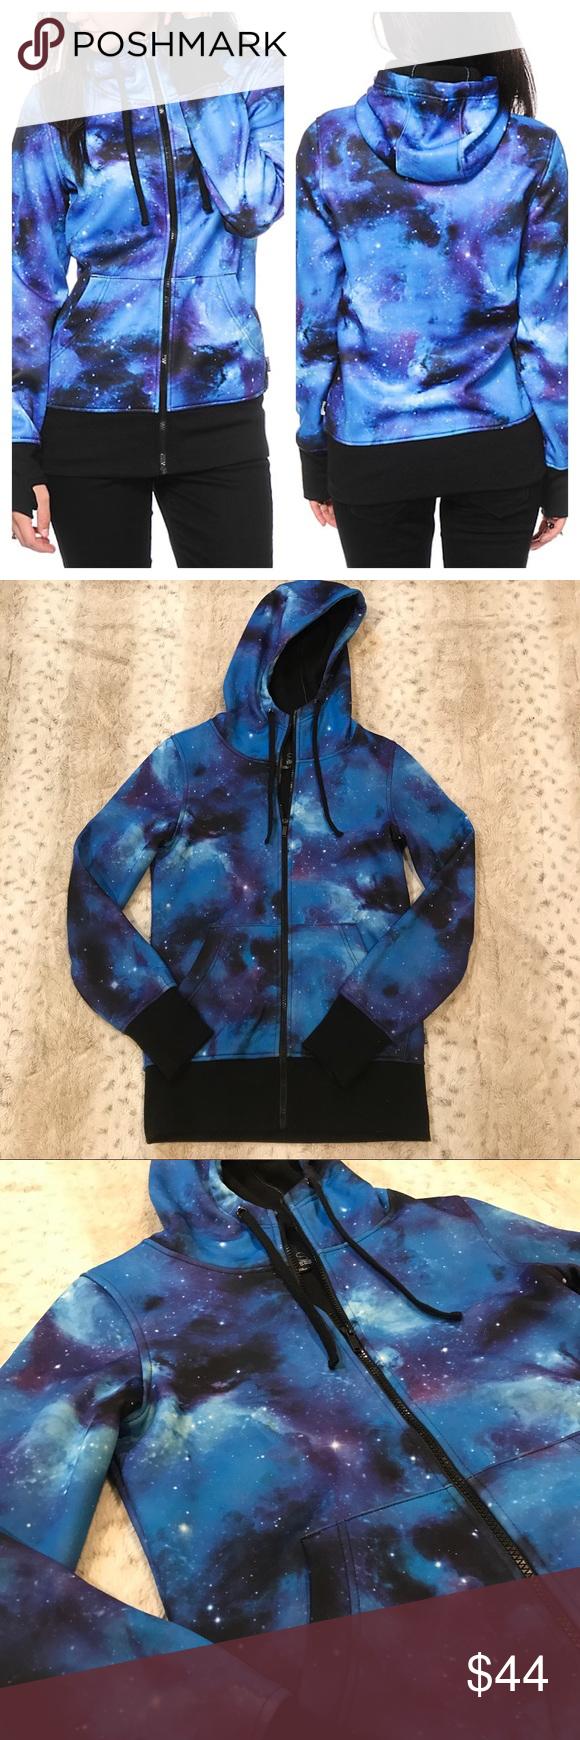 Empyre galaxy fleece jacket galaxy print hoods and conditioning